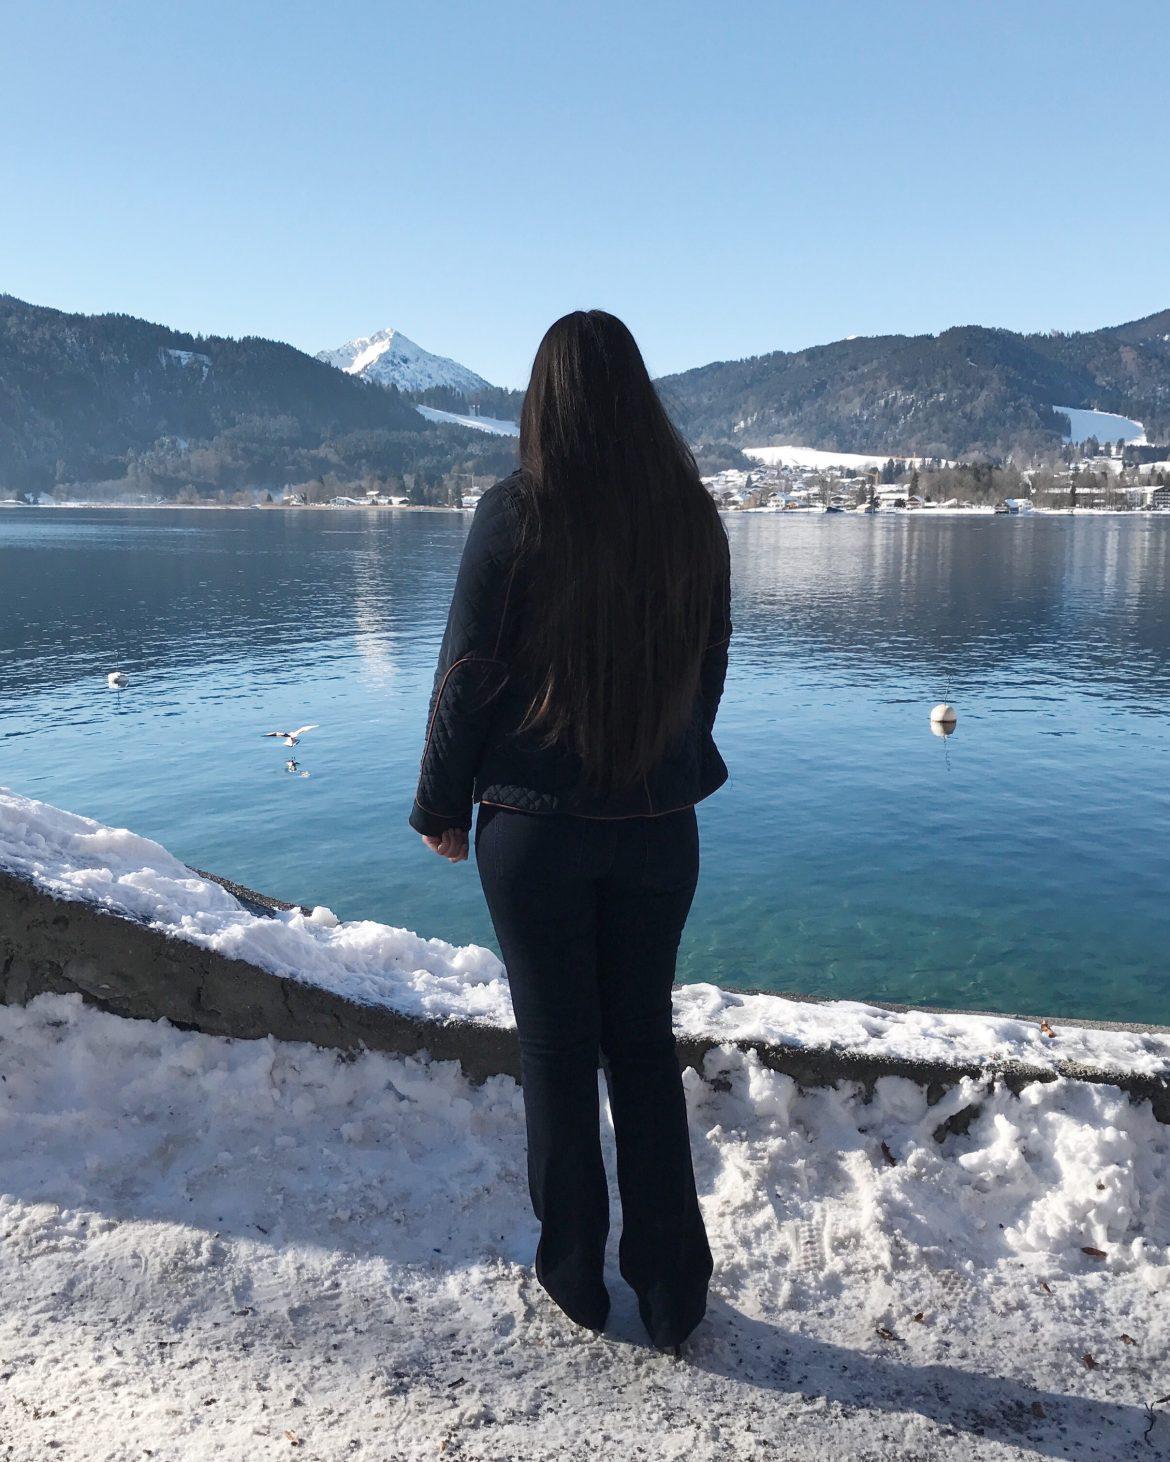 alemanha no inverno vista de costas